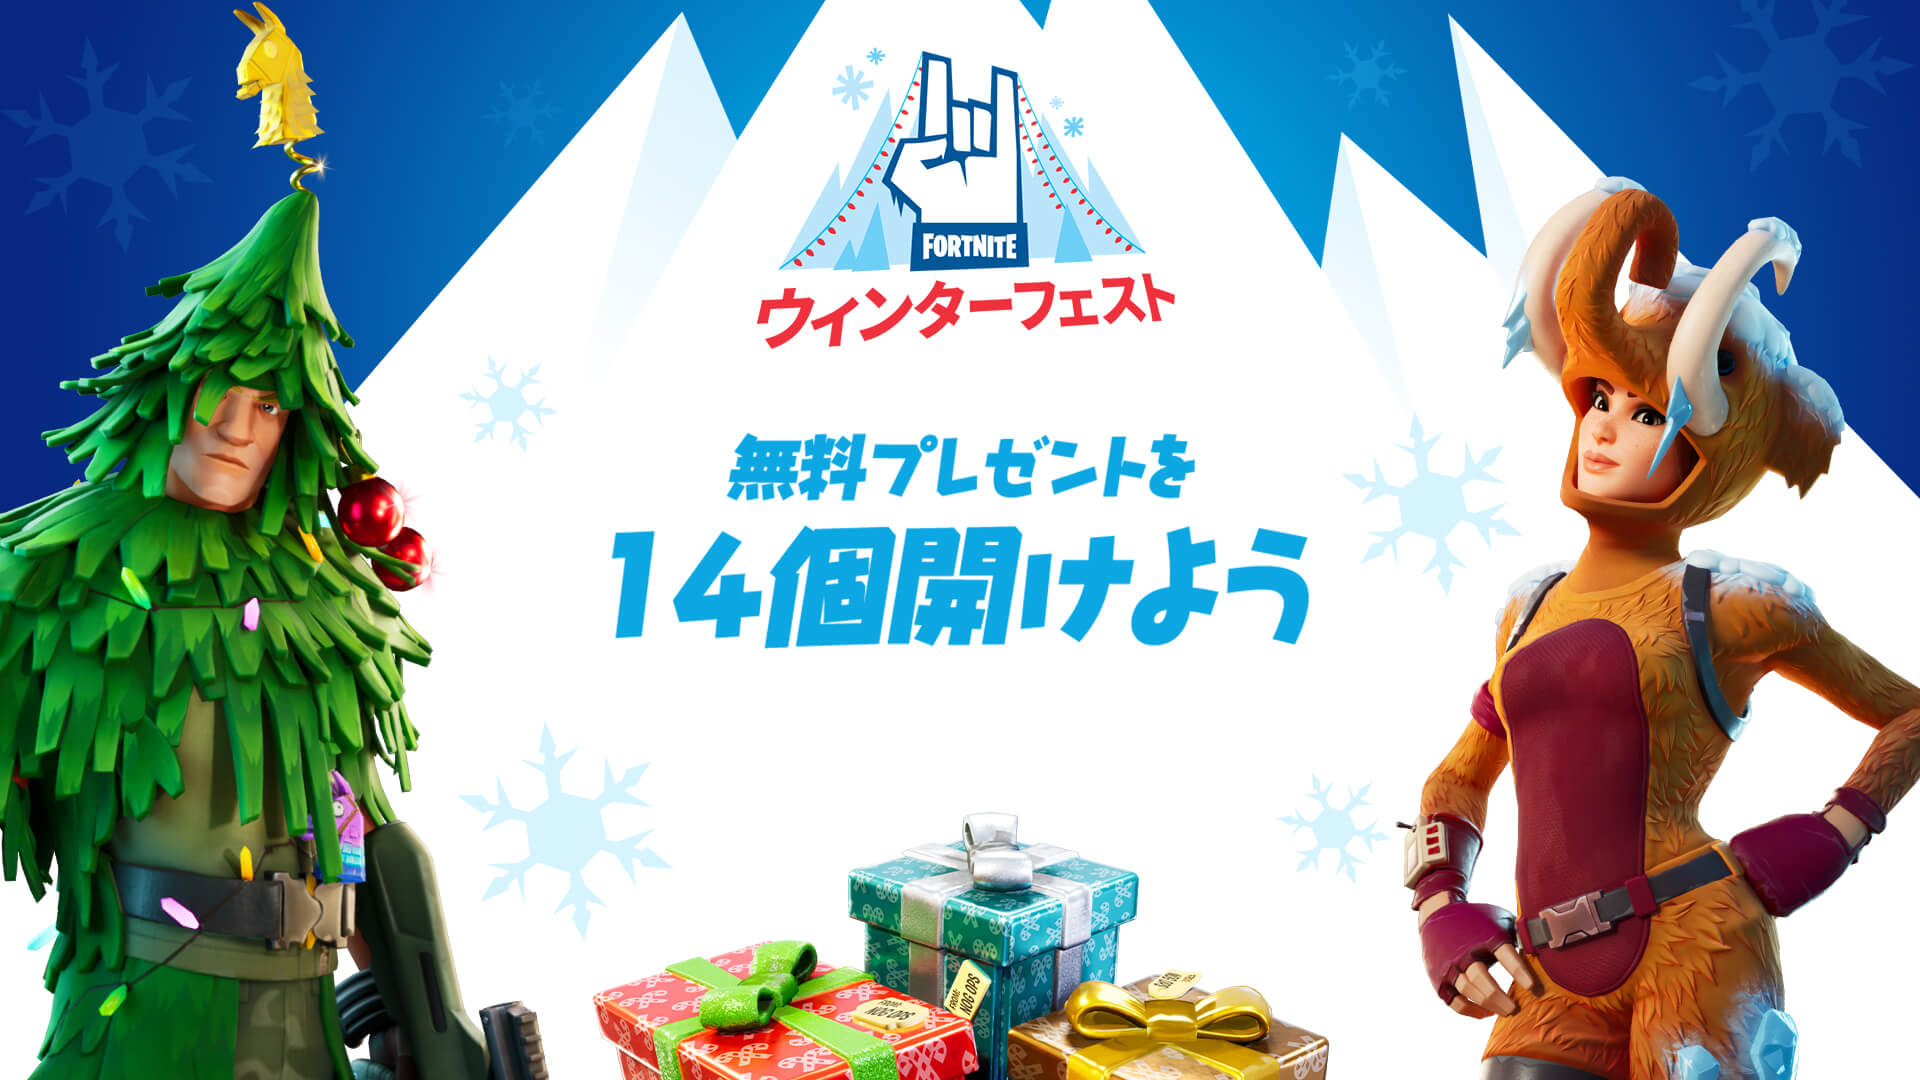 JP_11BR_WinterFest_Announce_Social.jpg